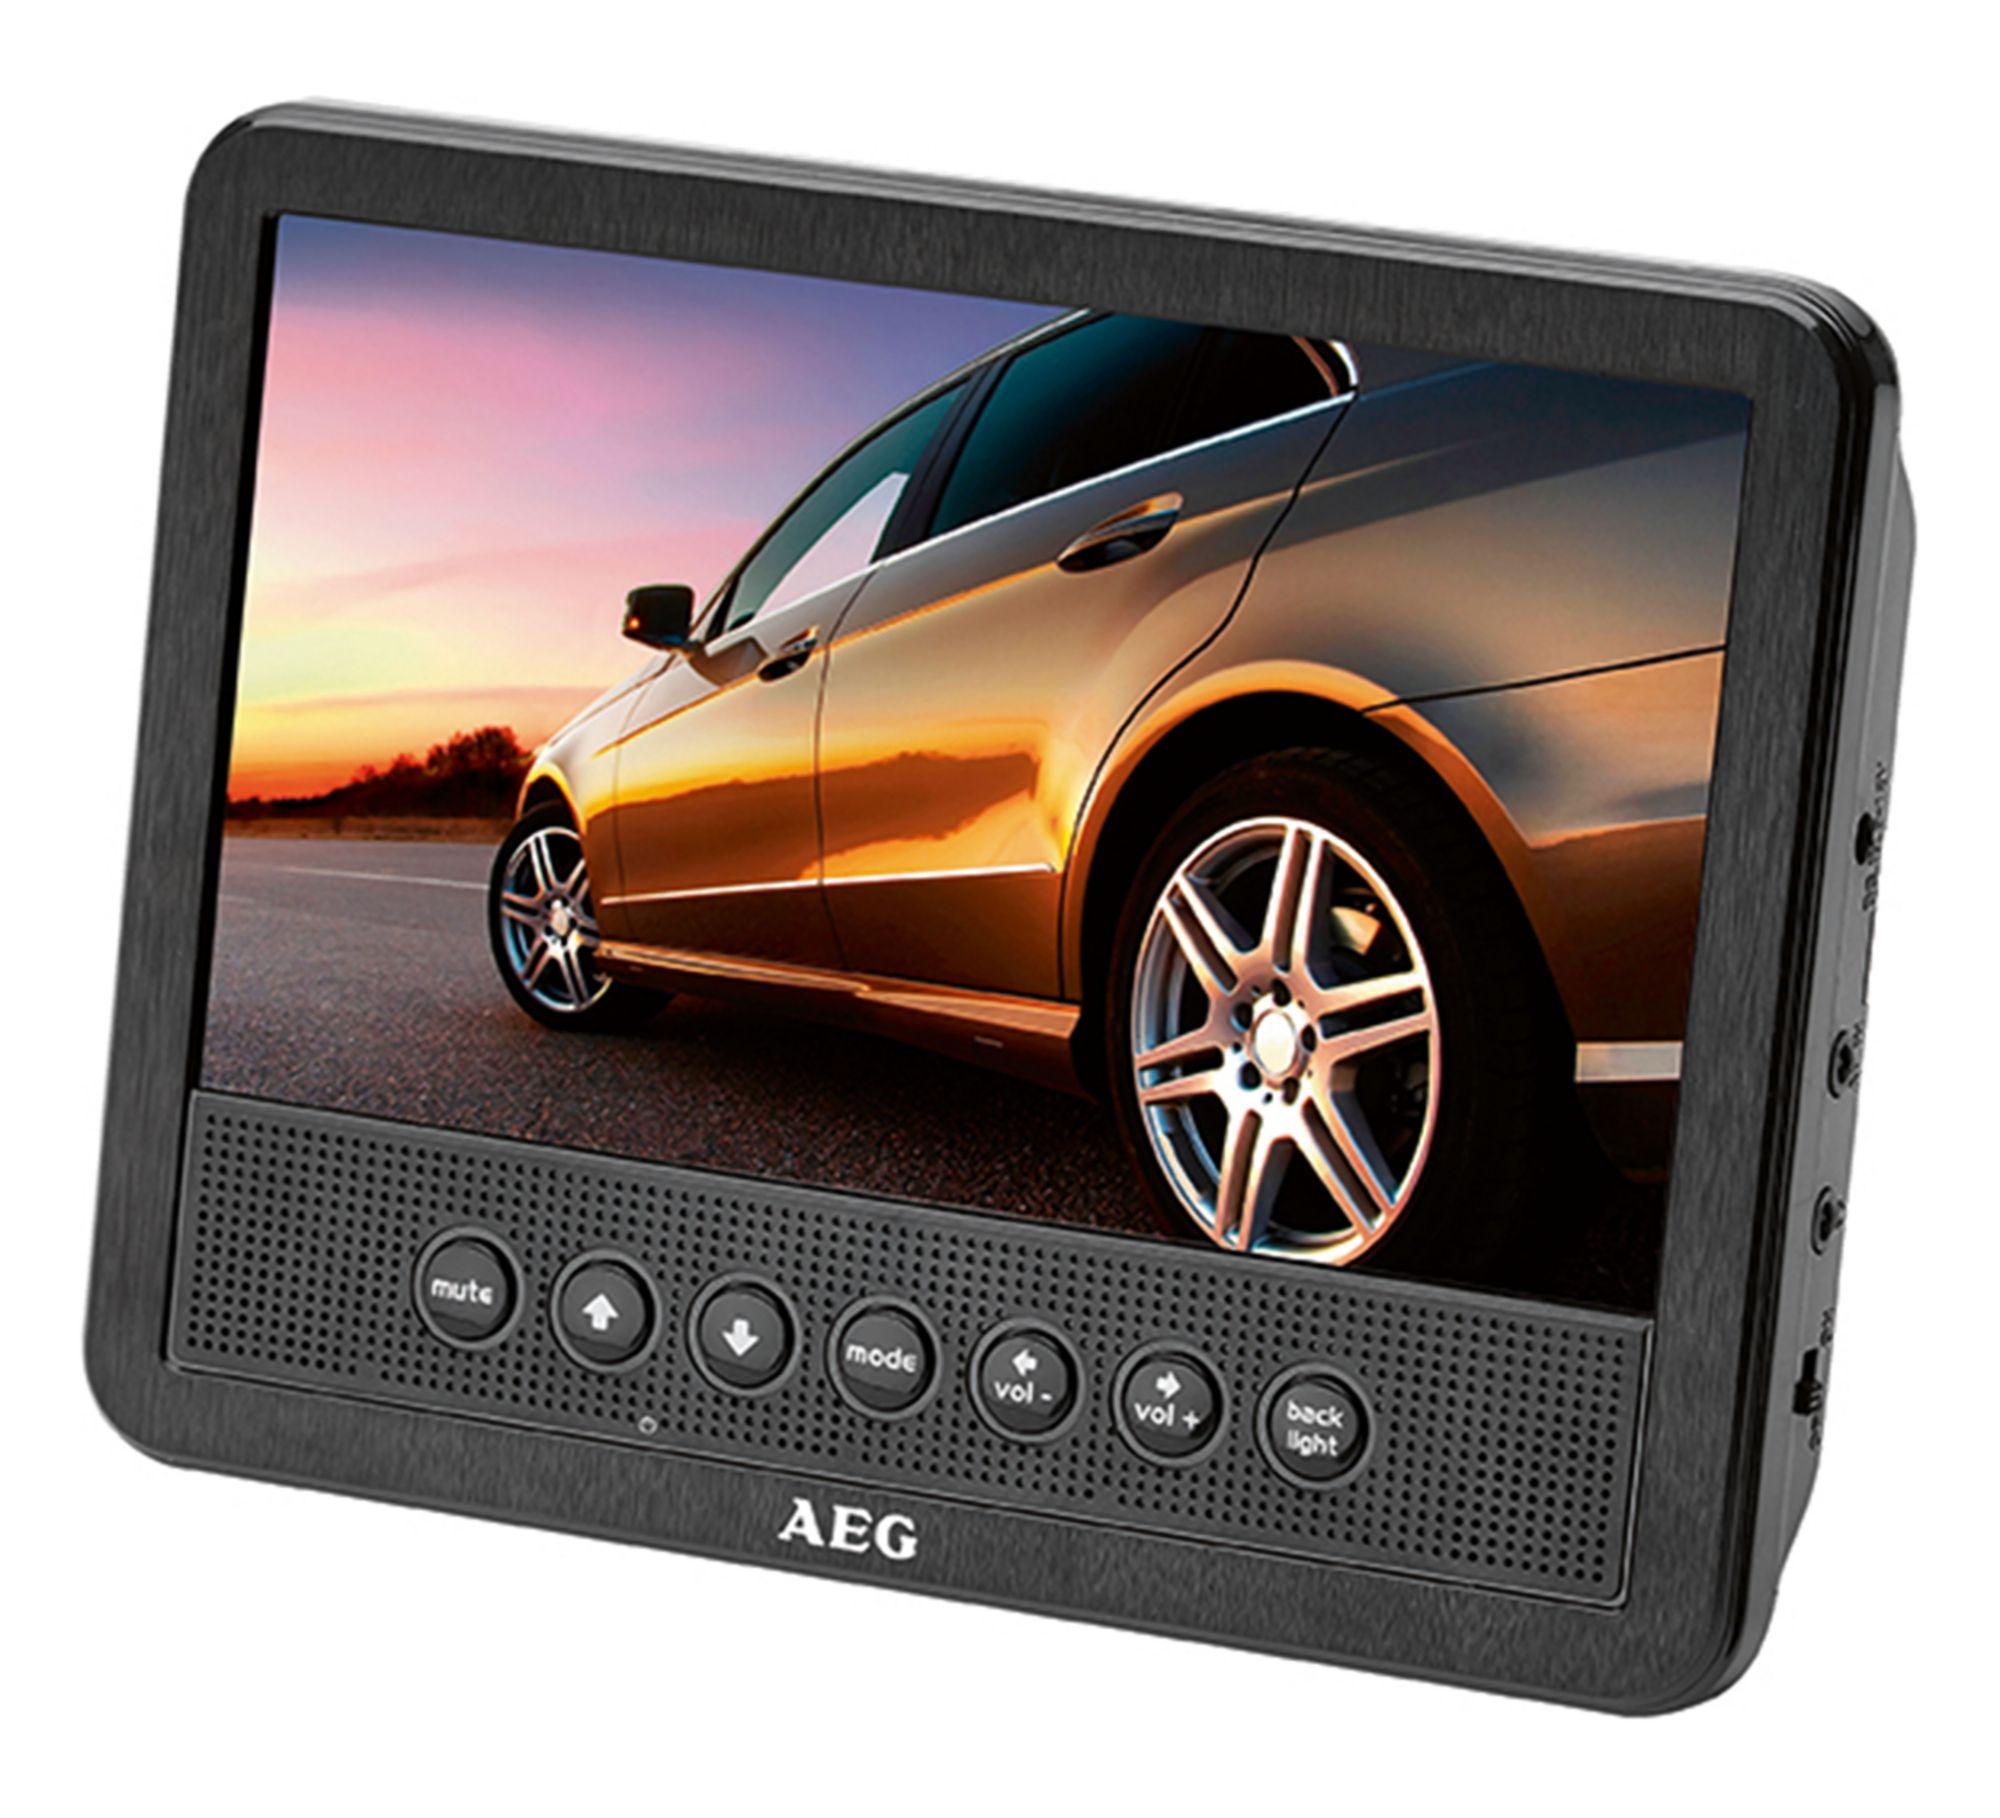 AEG  DVD 4555 Car Cinema Set 7 Zoll 2x7 Zoll TFT USB/CARD schwarz